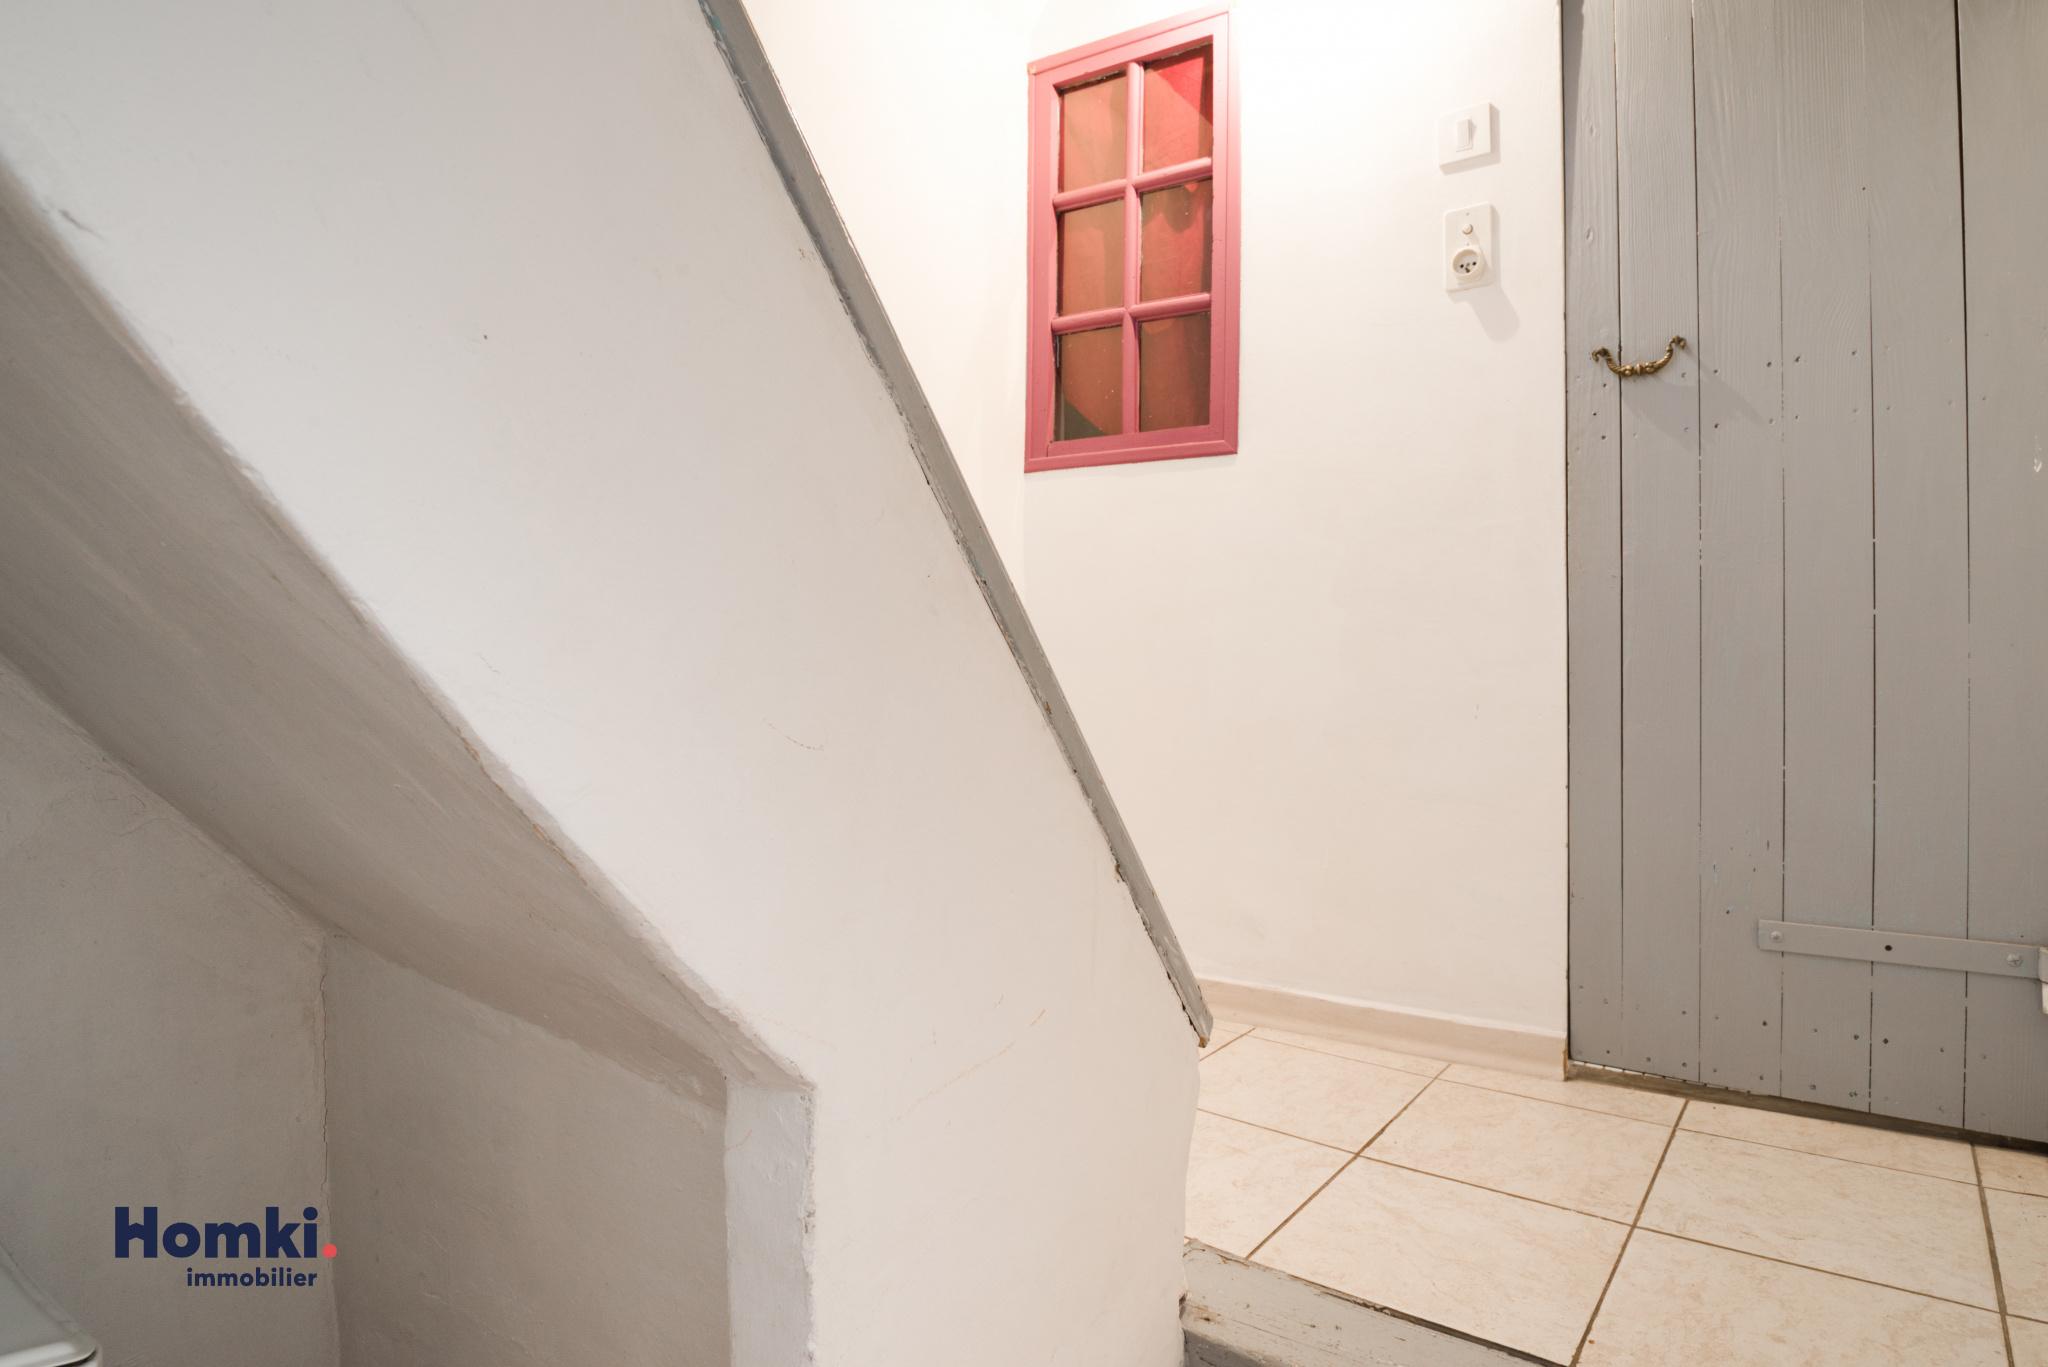 Homki - Vente immeuble  de 200.0 m² à manosque 04100